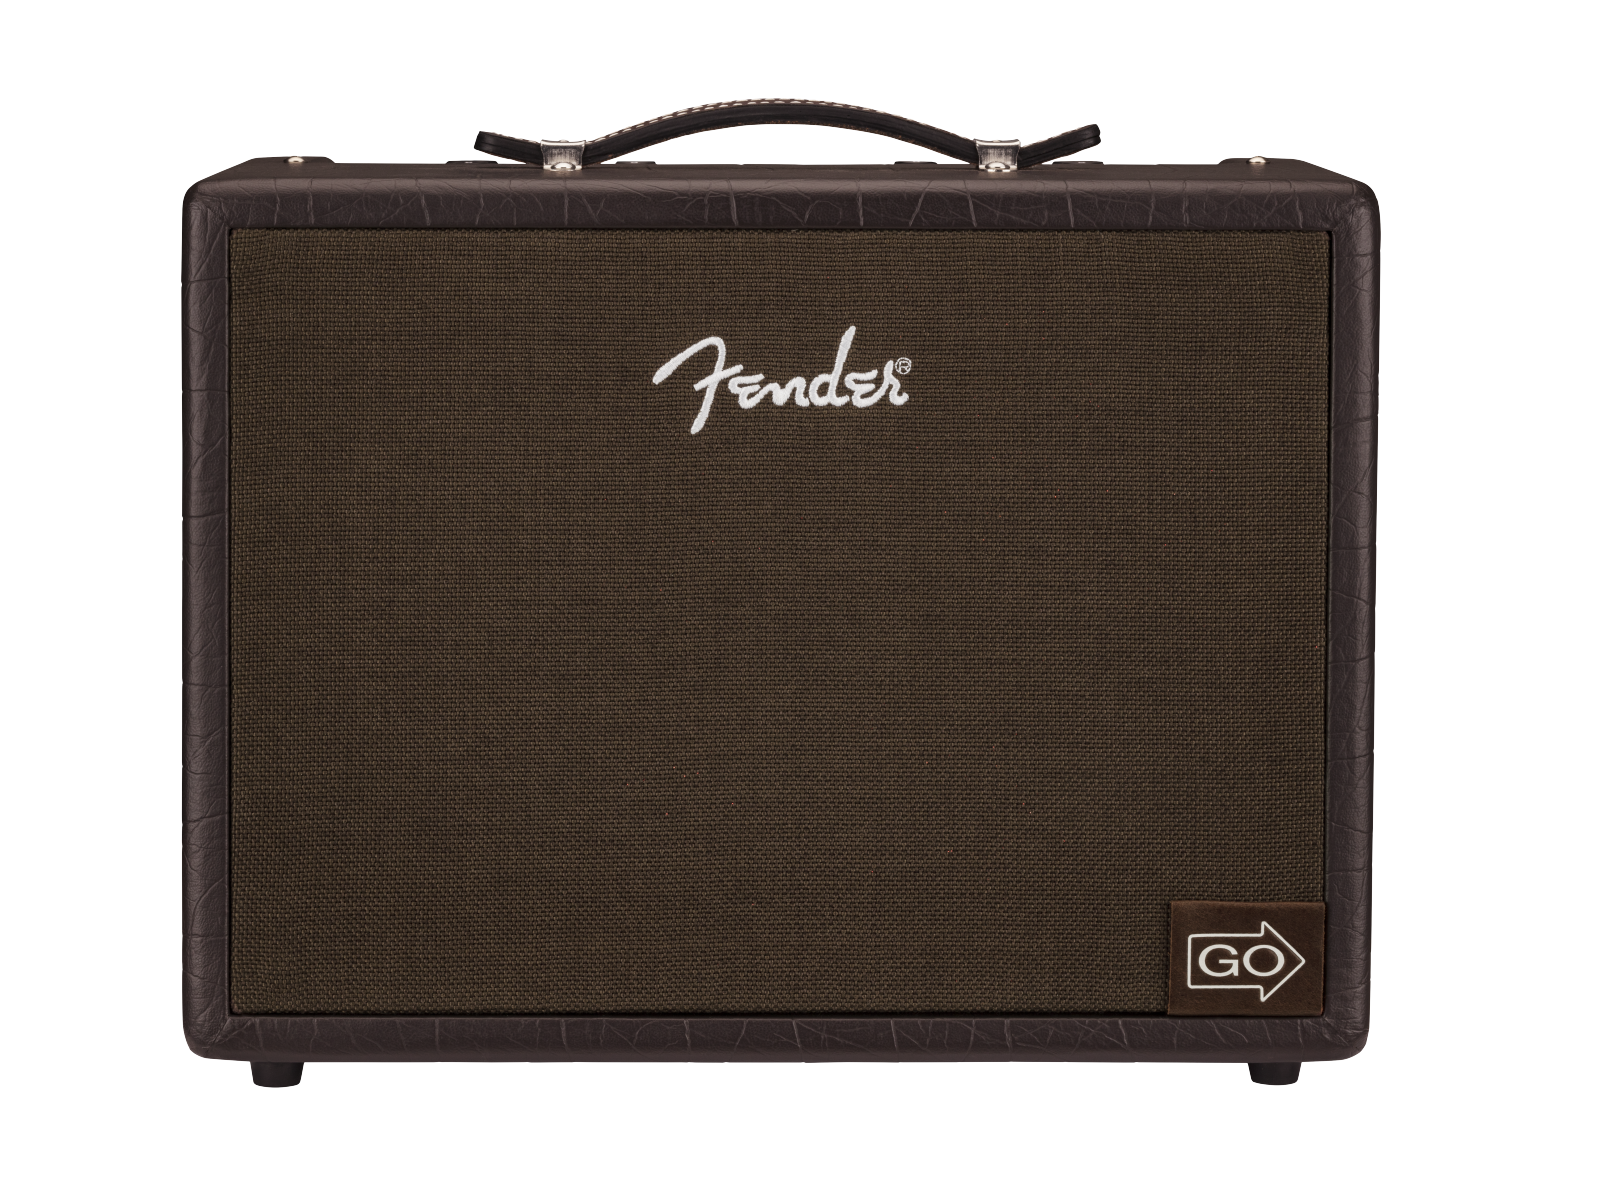 Fender Acoustic Junior GO Amplifier